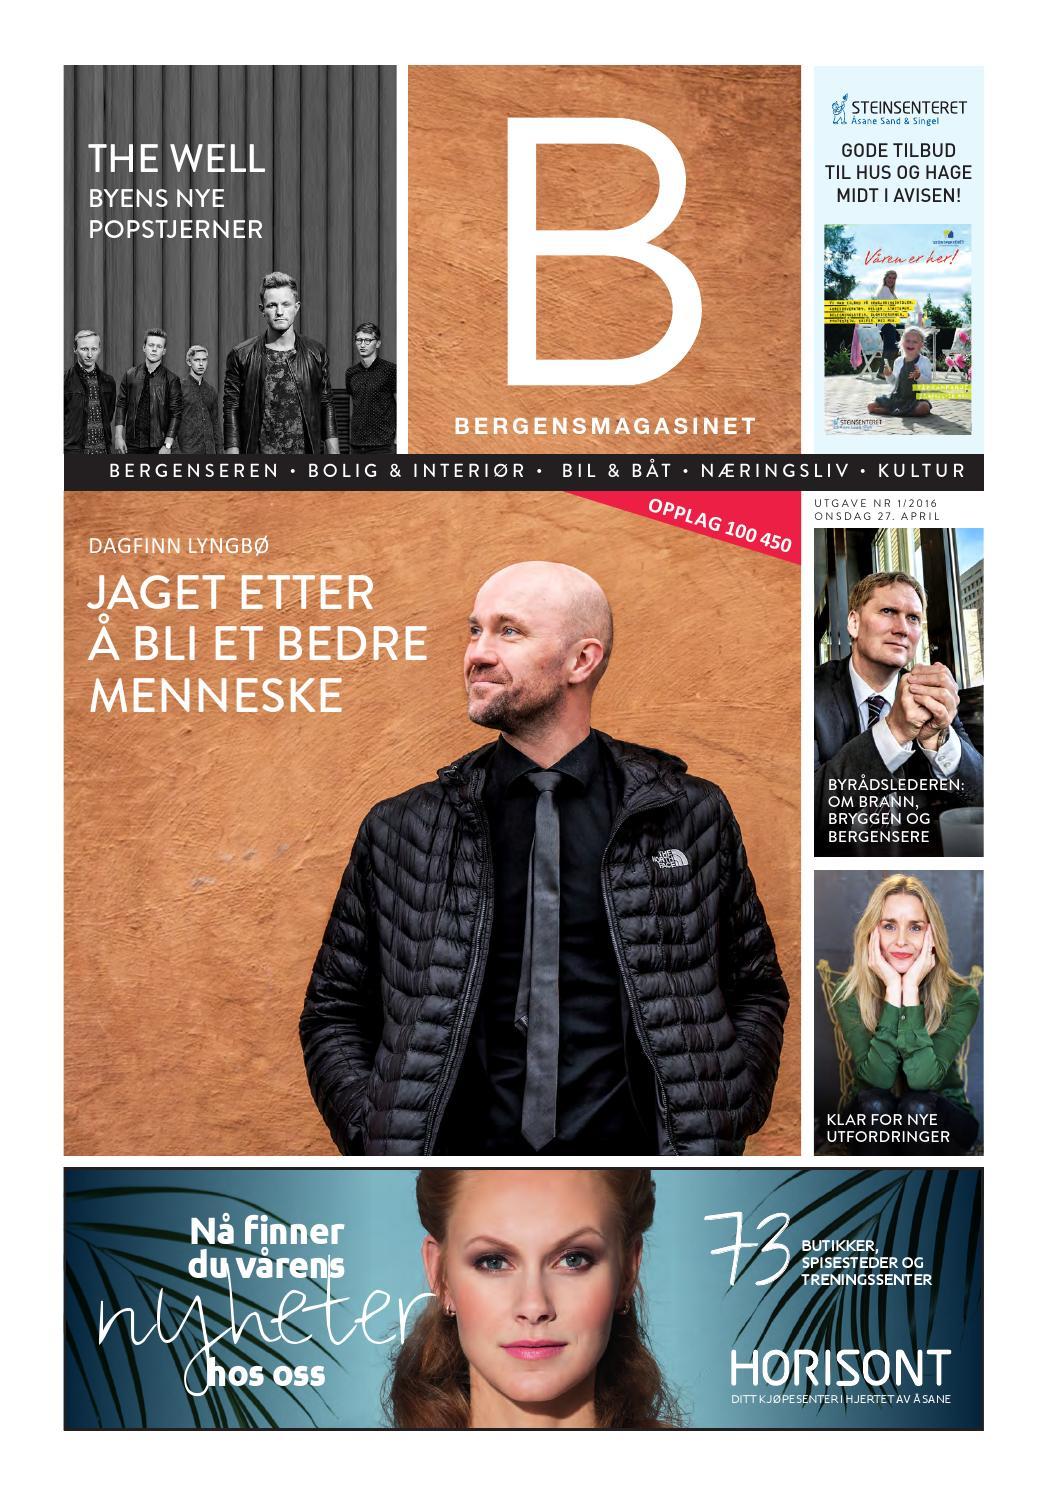 bab5891c6 Bergensmagasinet no 1 by Molvik - issuu